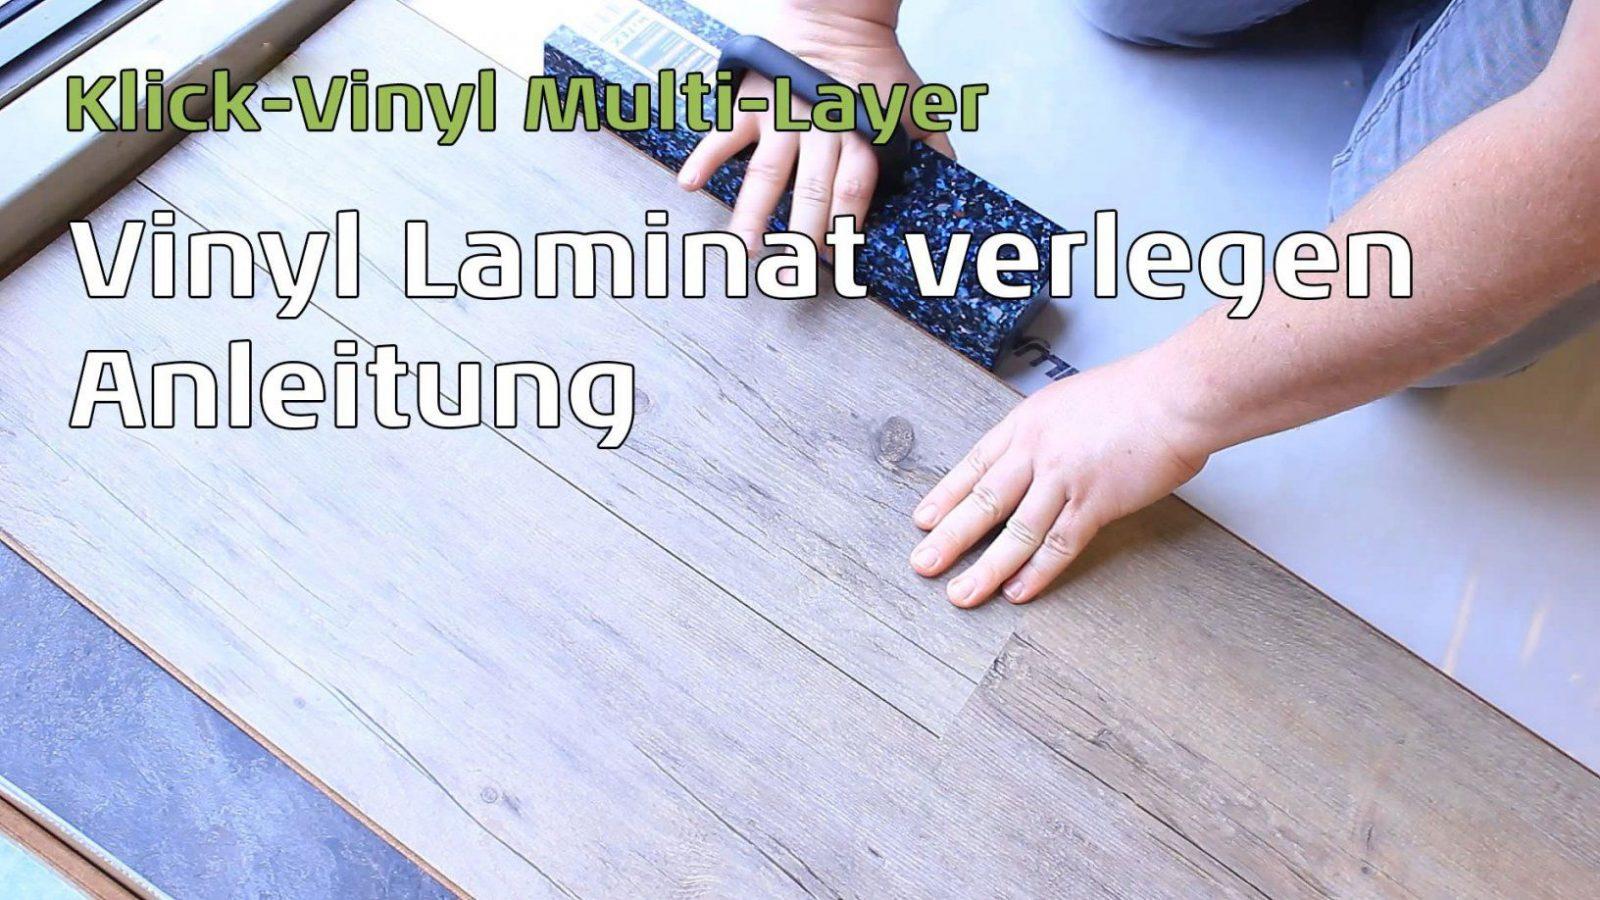 Vinyl Laminat (Mulitlayer) Verlegen  Anleitung  Youtube von Laminat Verlegen Anleitung Video Photo